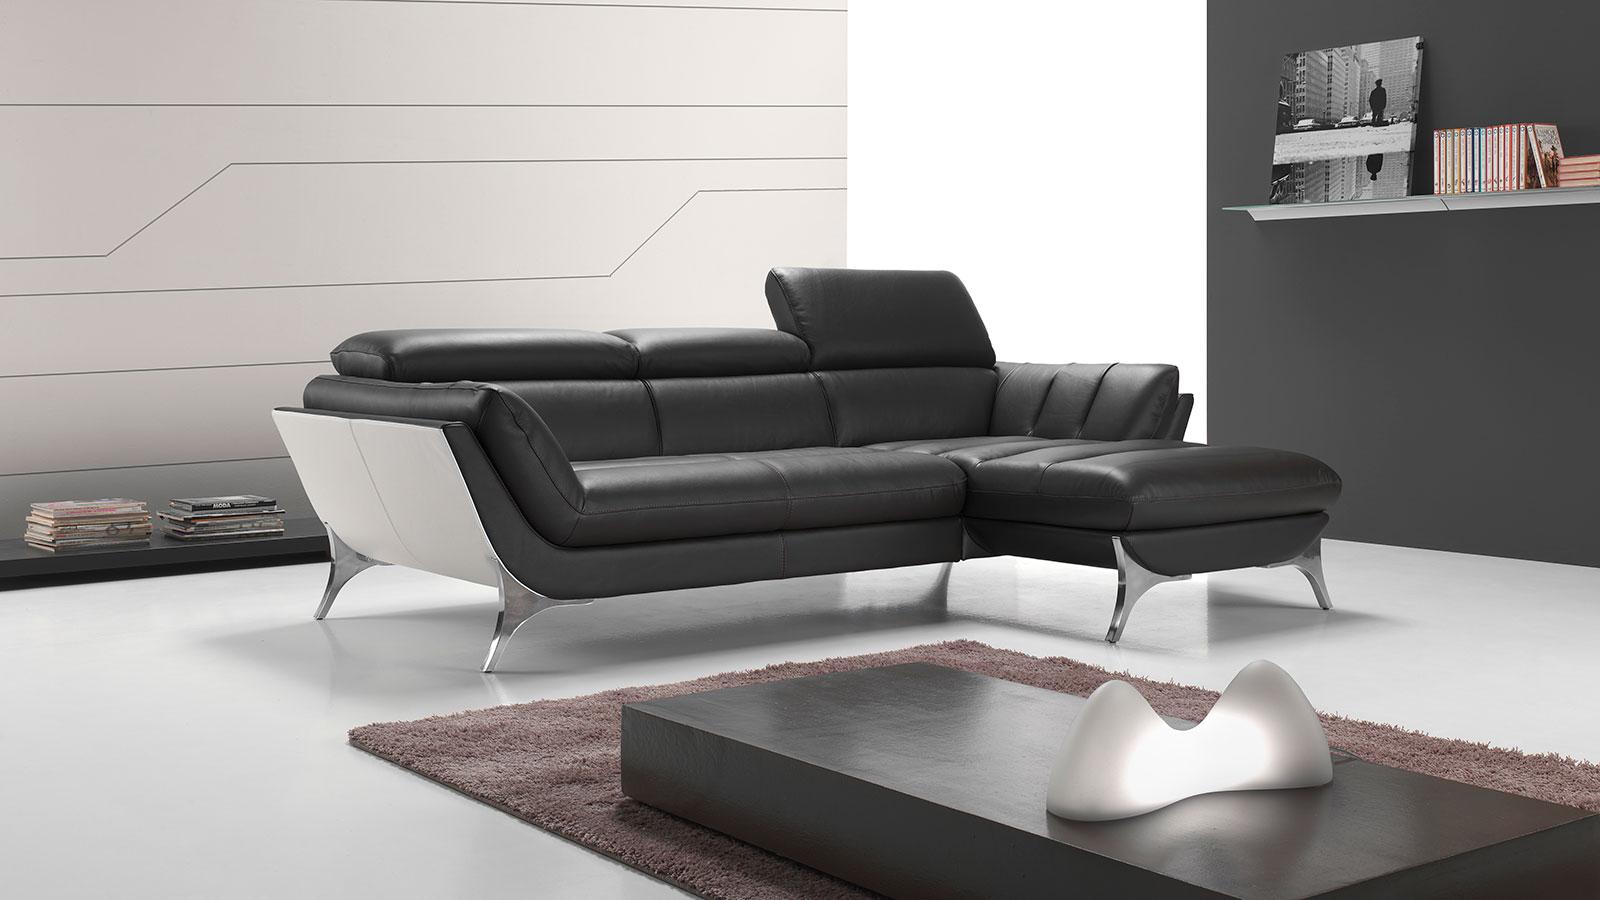 sofas divatto 201440 revista muebles mobiliario de dise o